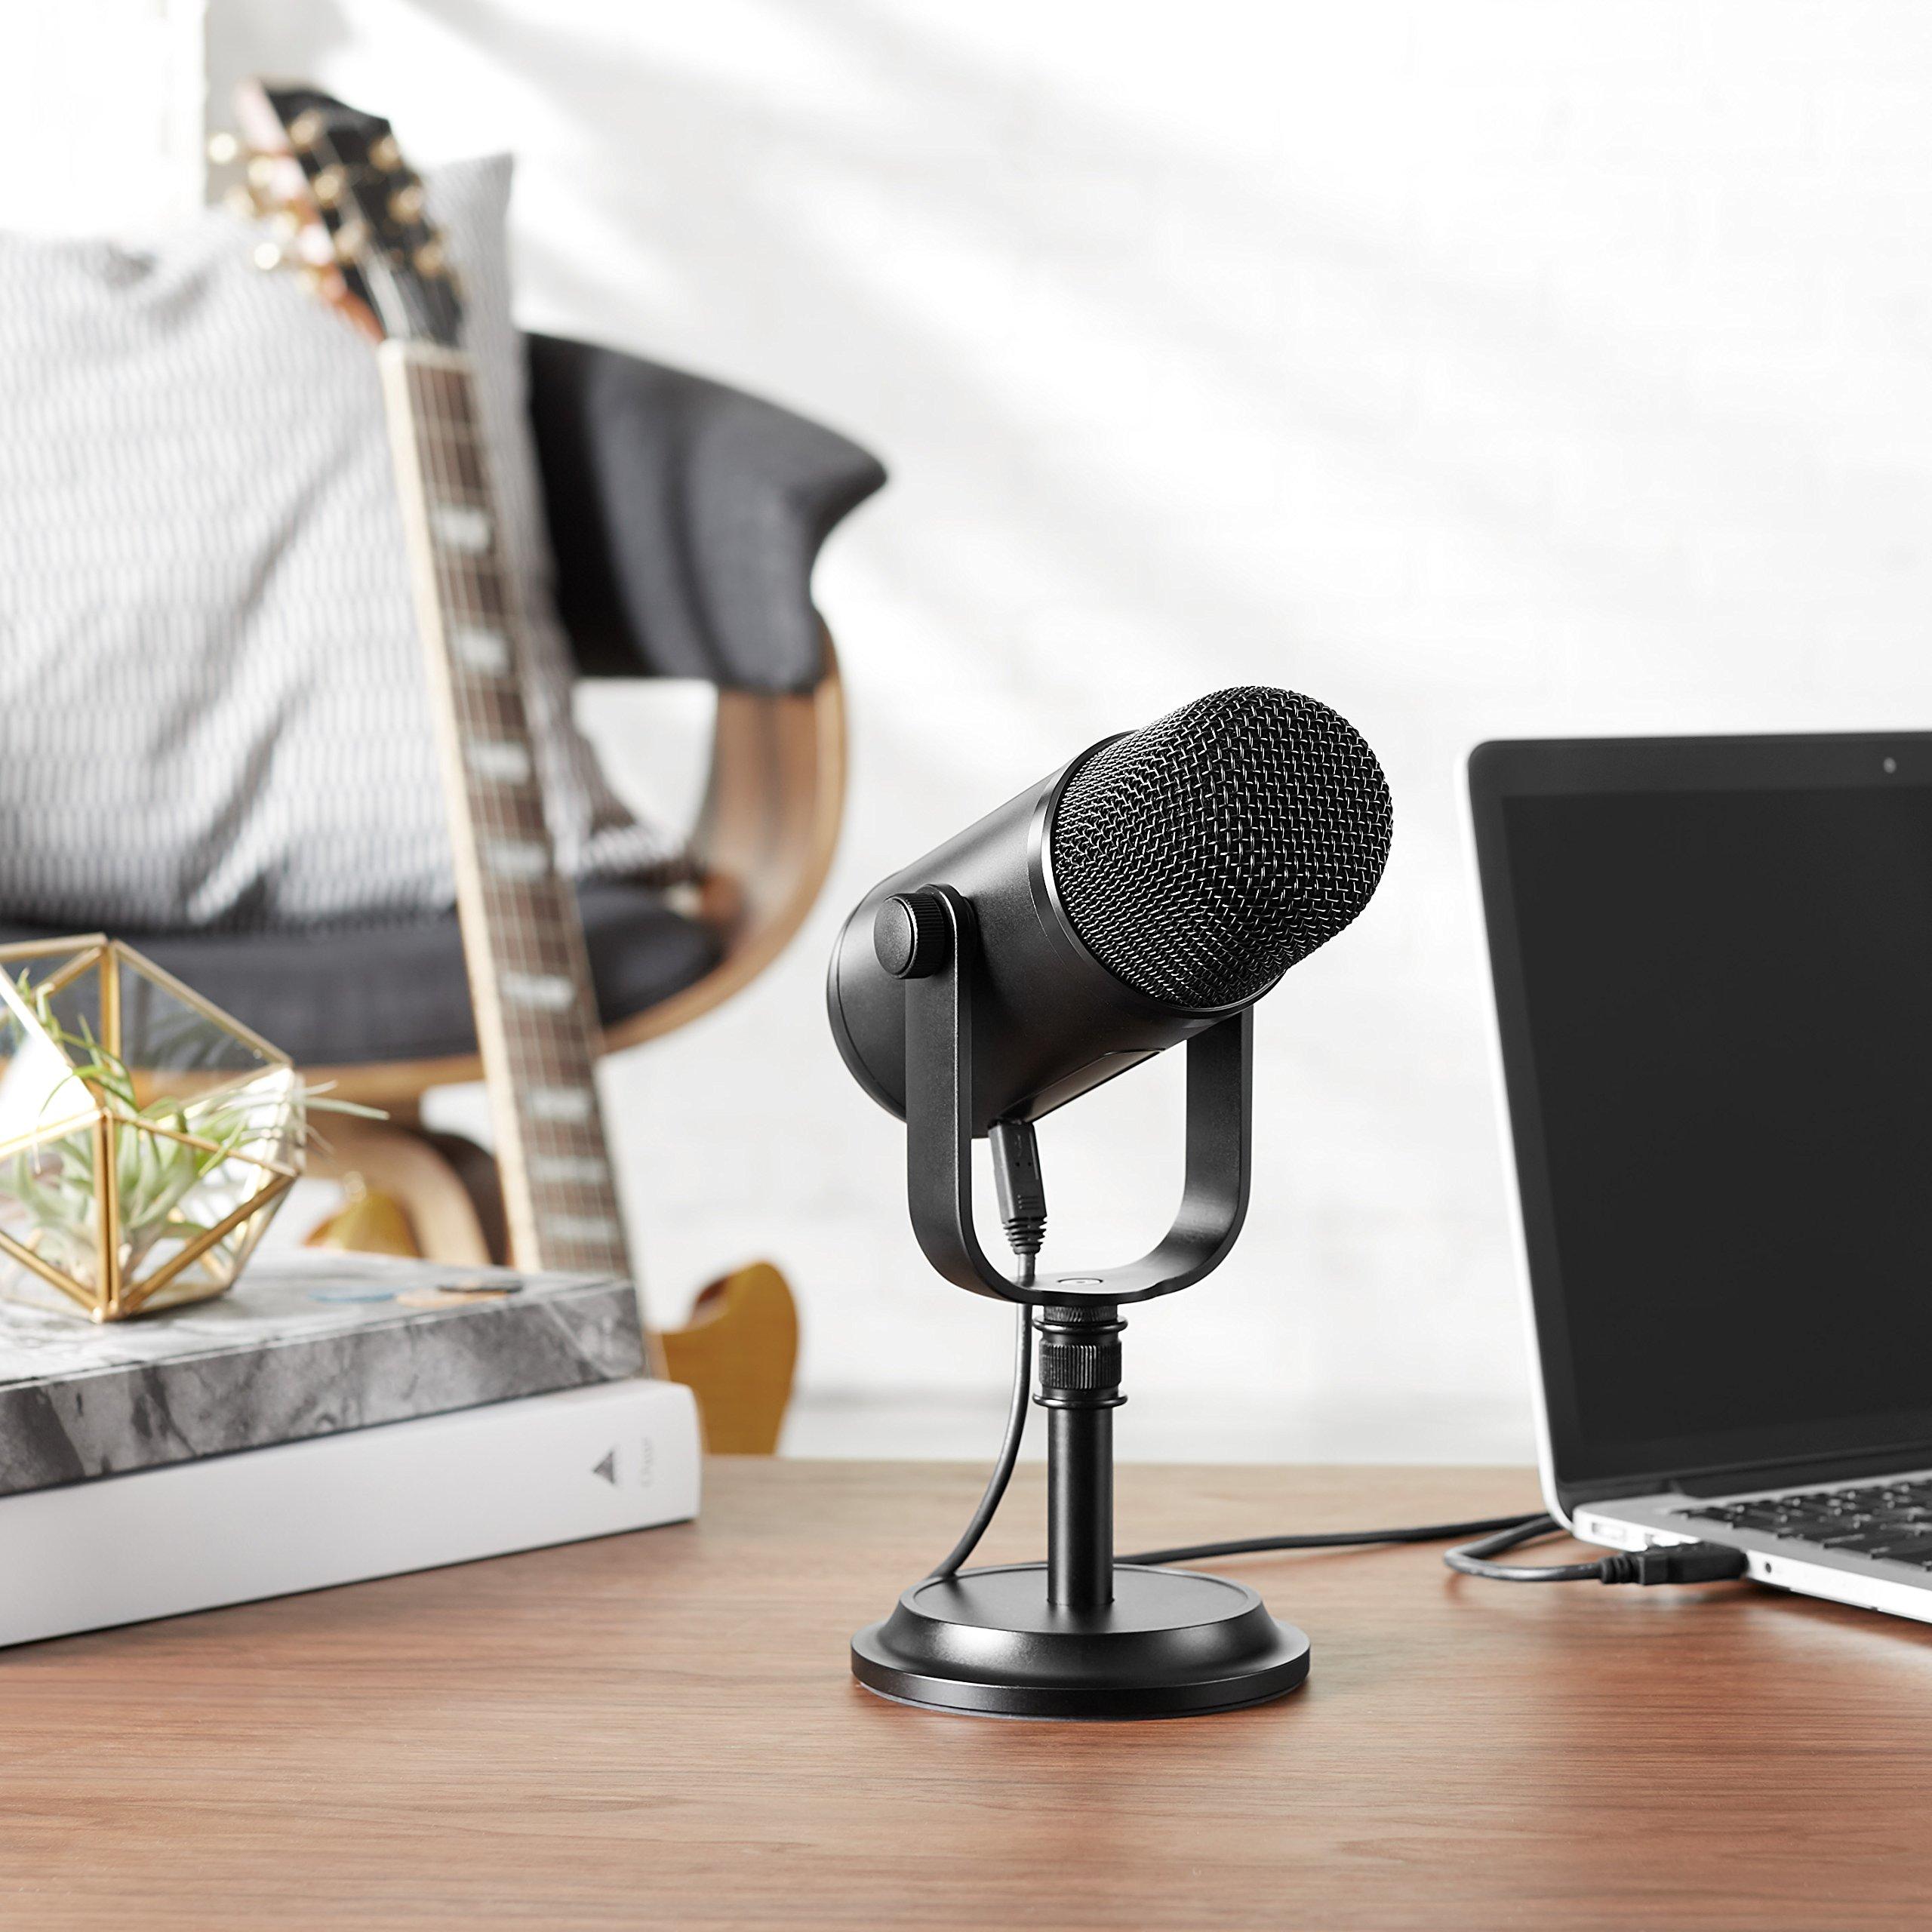 amazonbasics professional usb condenser microphone black techadict. Black Bedroom Furniture Sets. Home Design Ideas